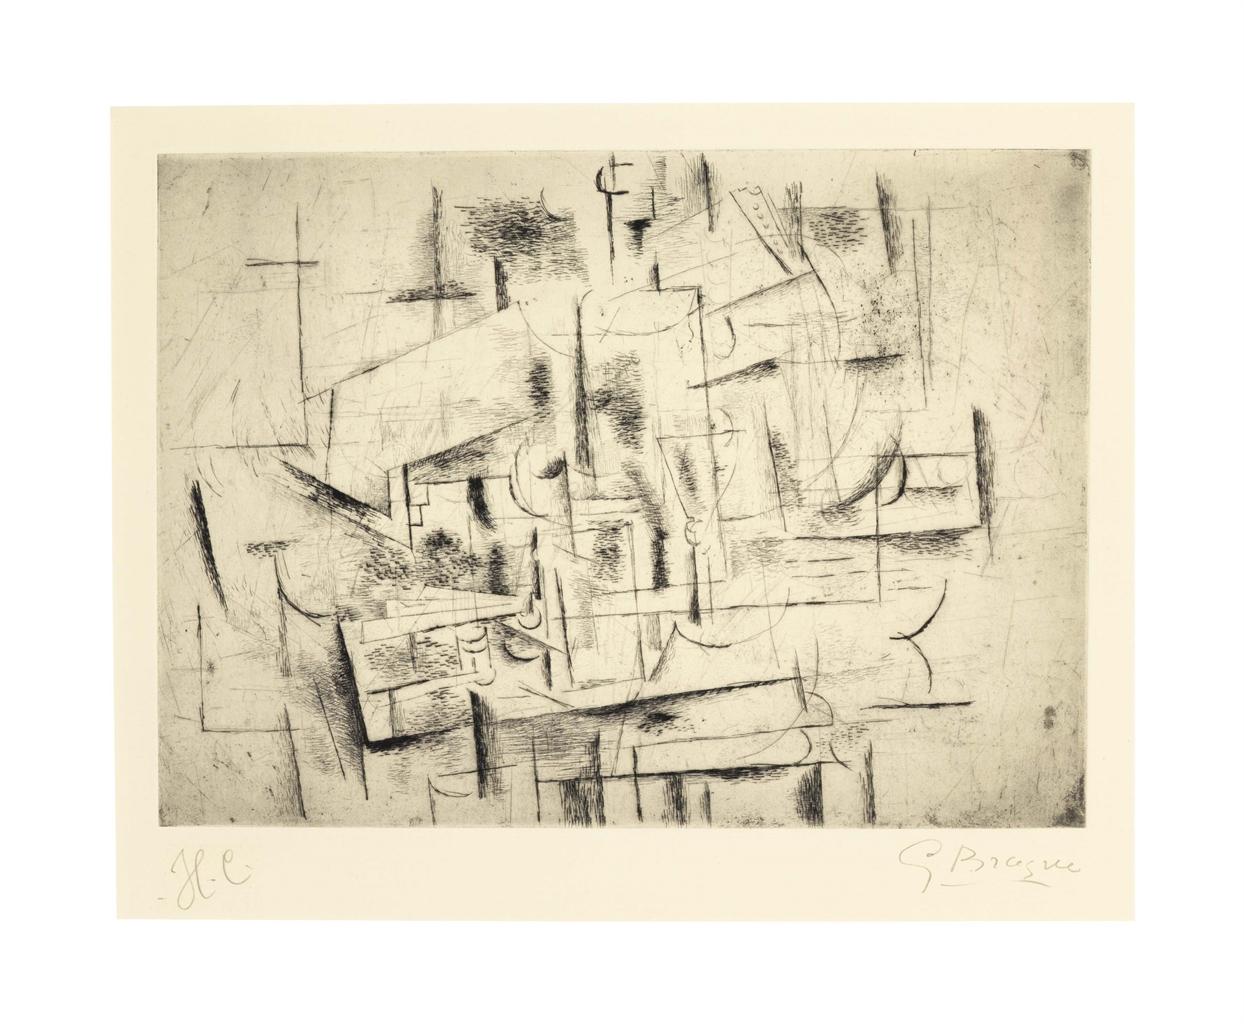 Georges Braque-Nature Morte II-1912